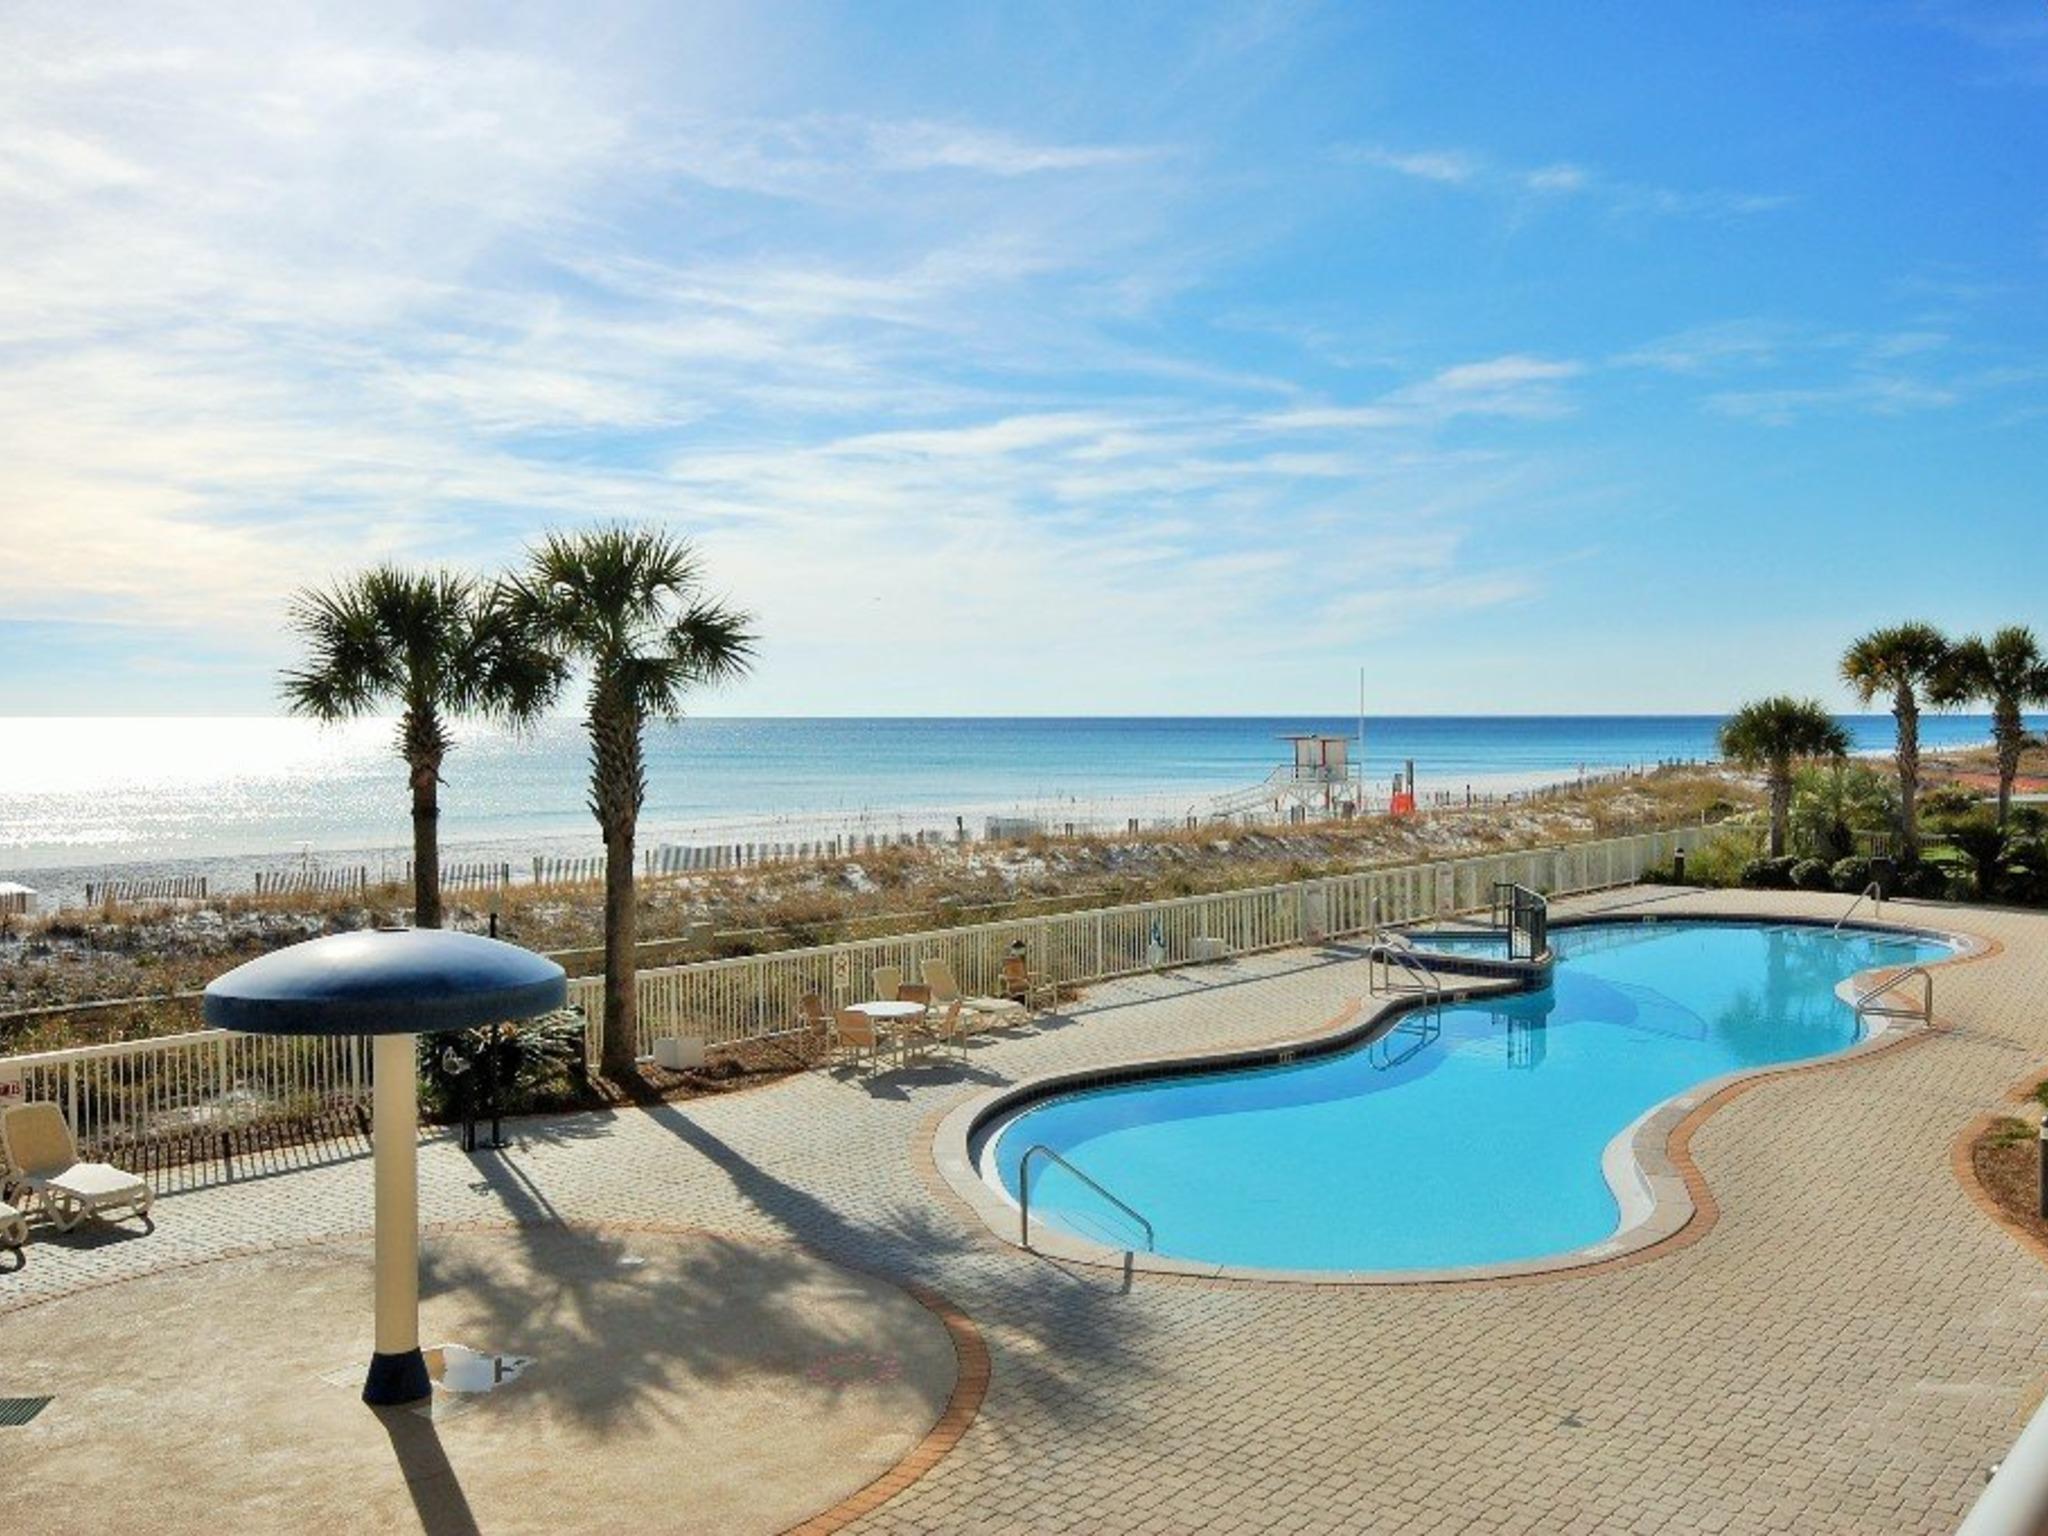 209 Azure Free Beach Service Great View Luxury Resort Condo